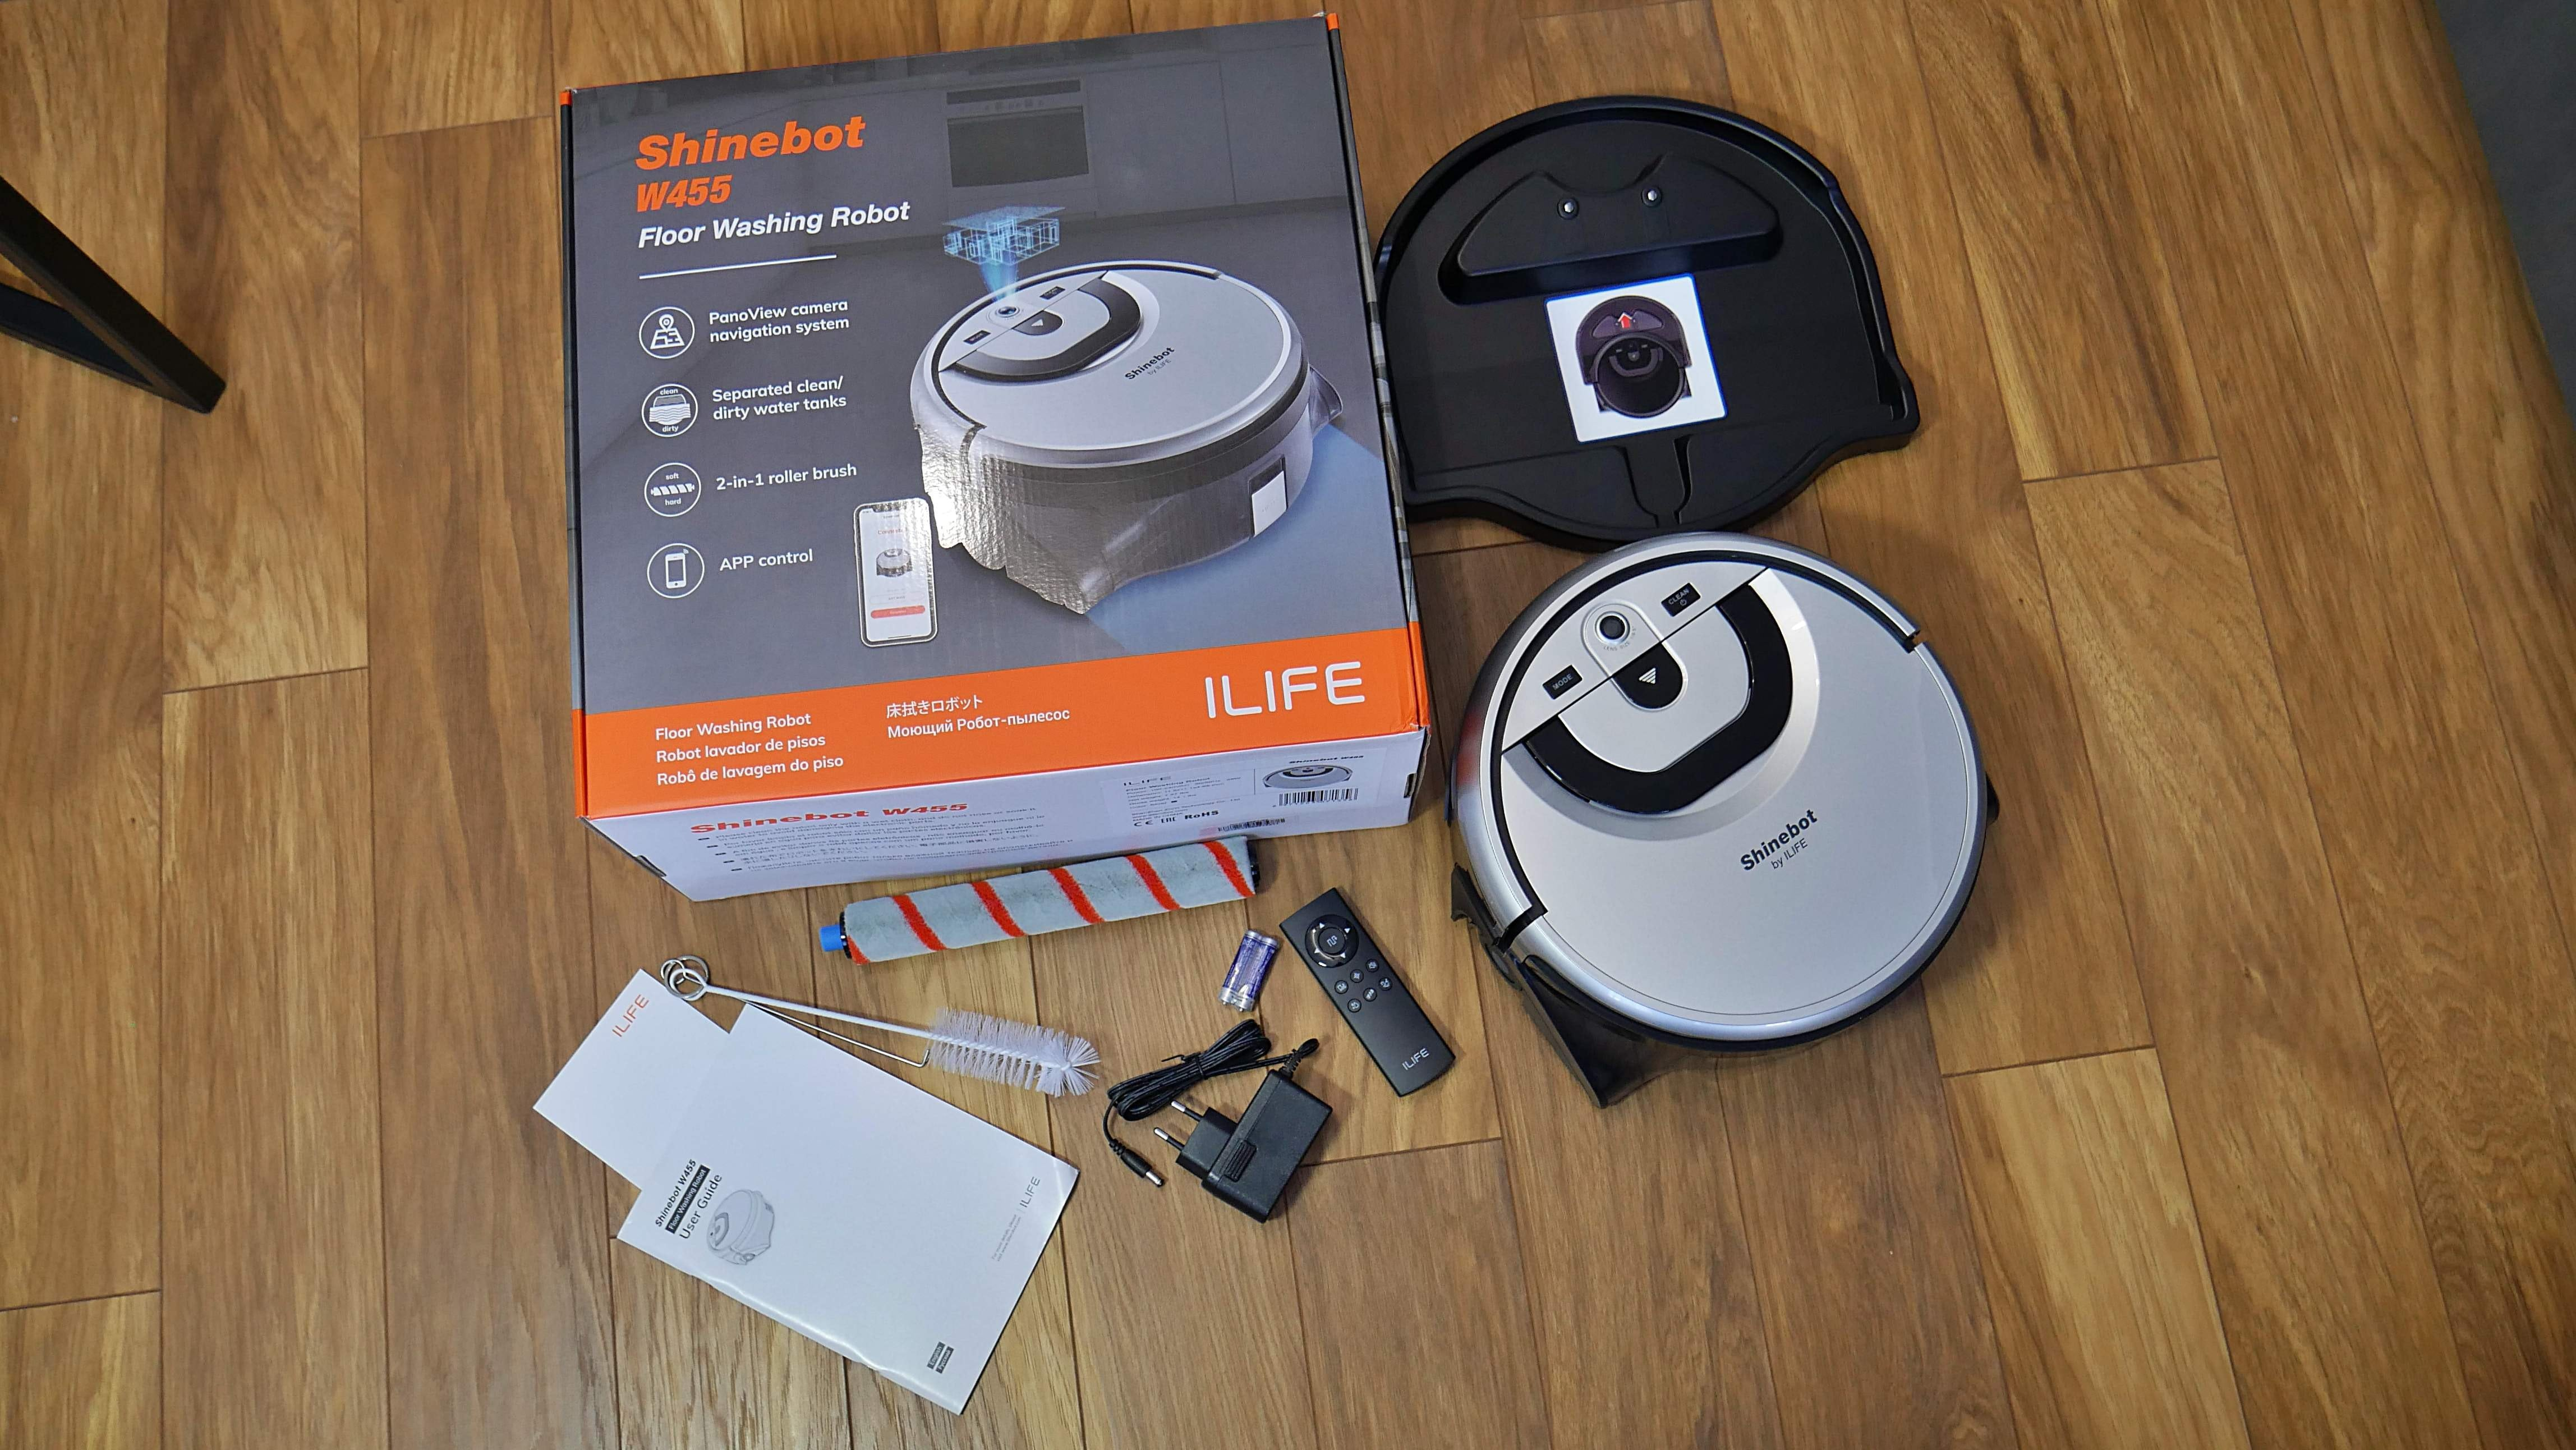 ILIFE Shinebot W455 / fot. Kacper Żarski (oiot.pl)